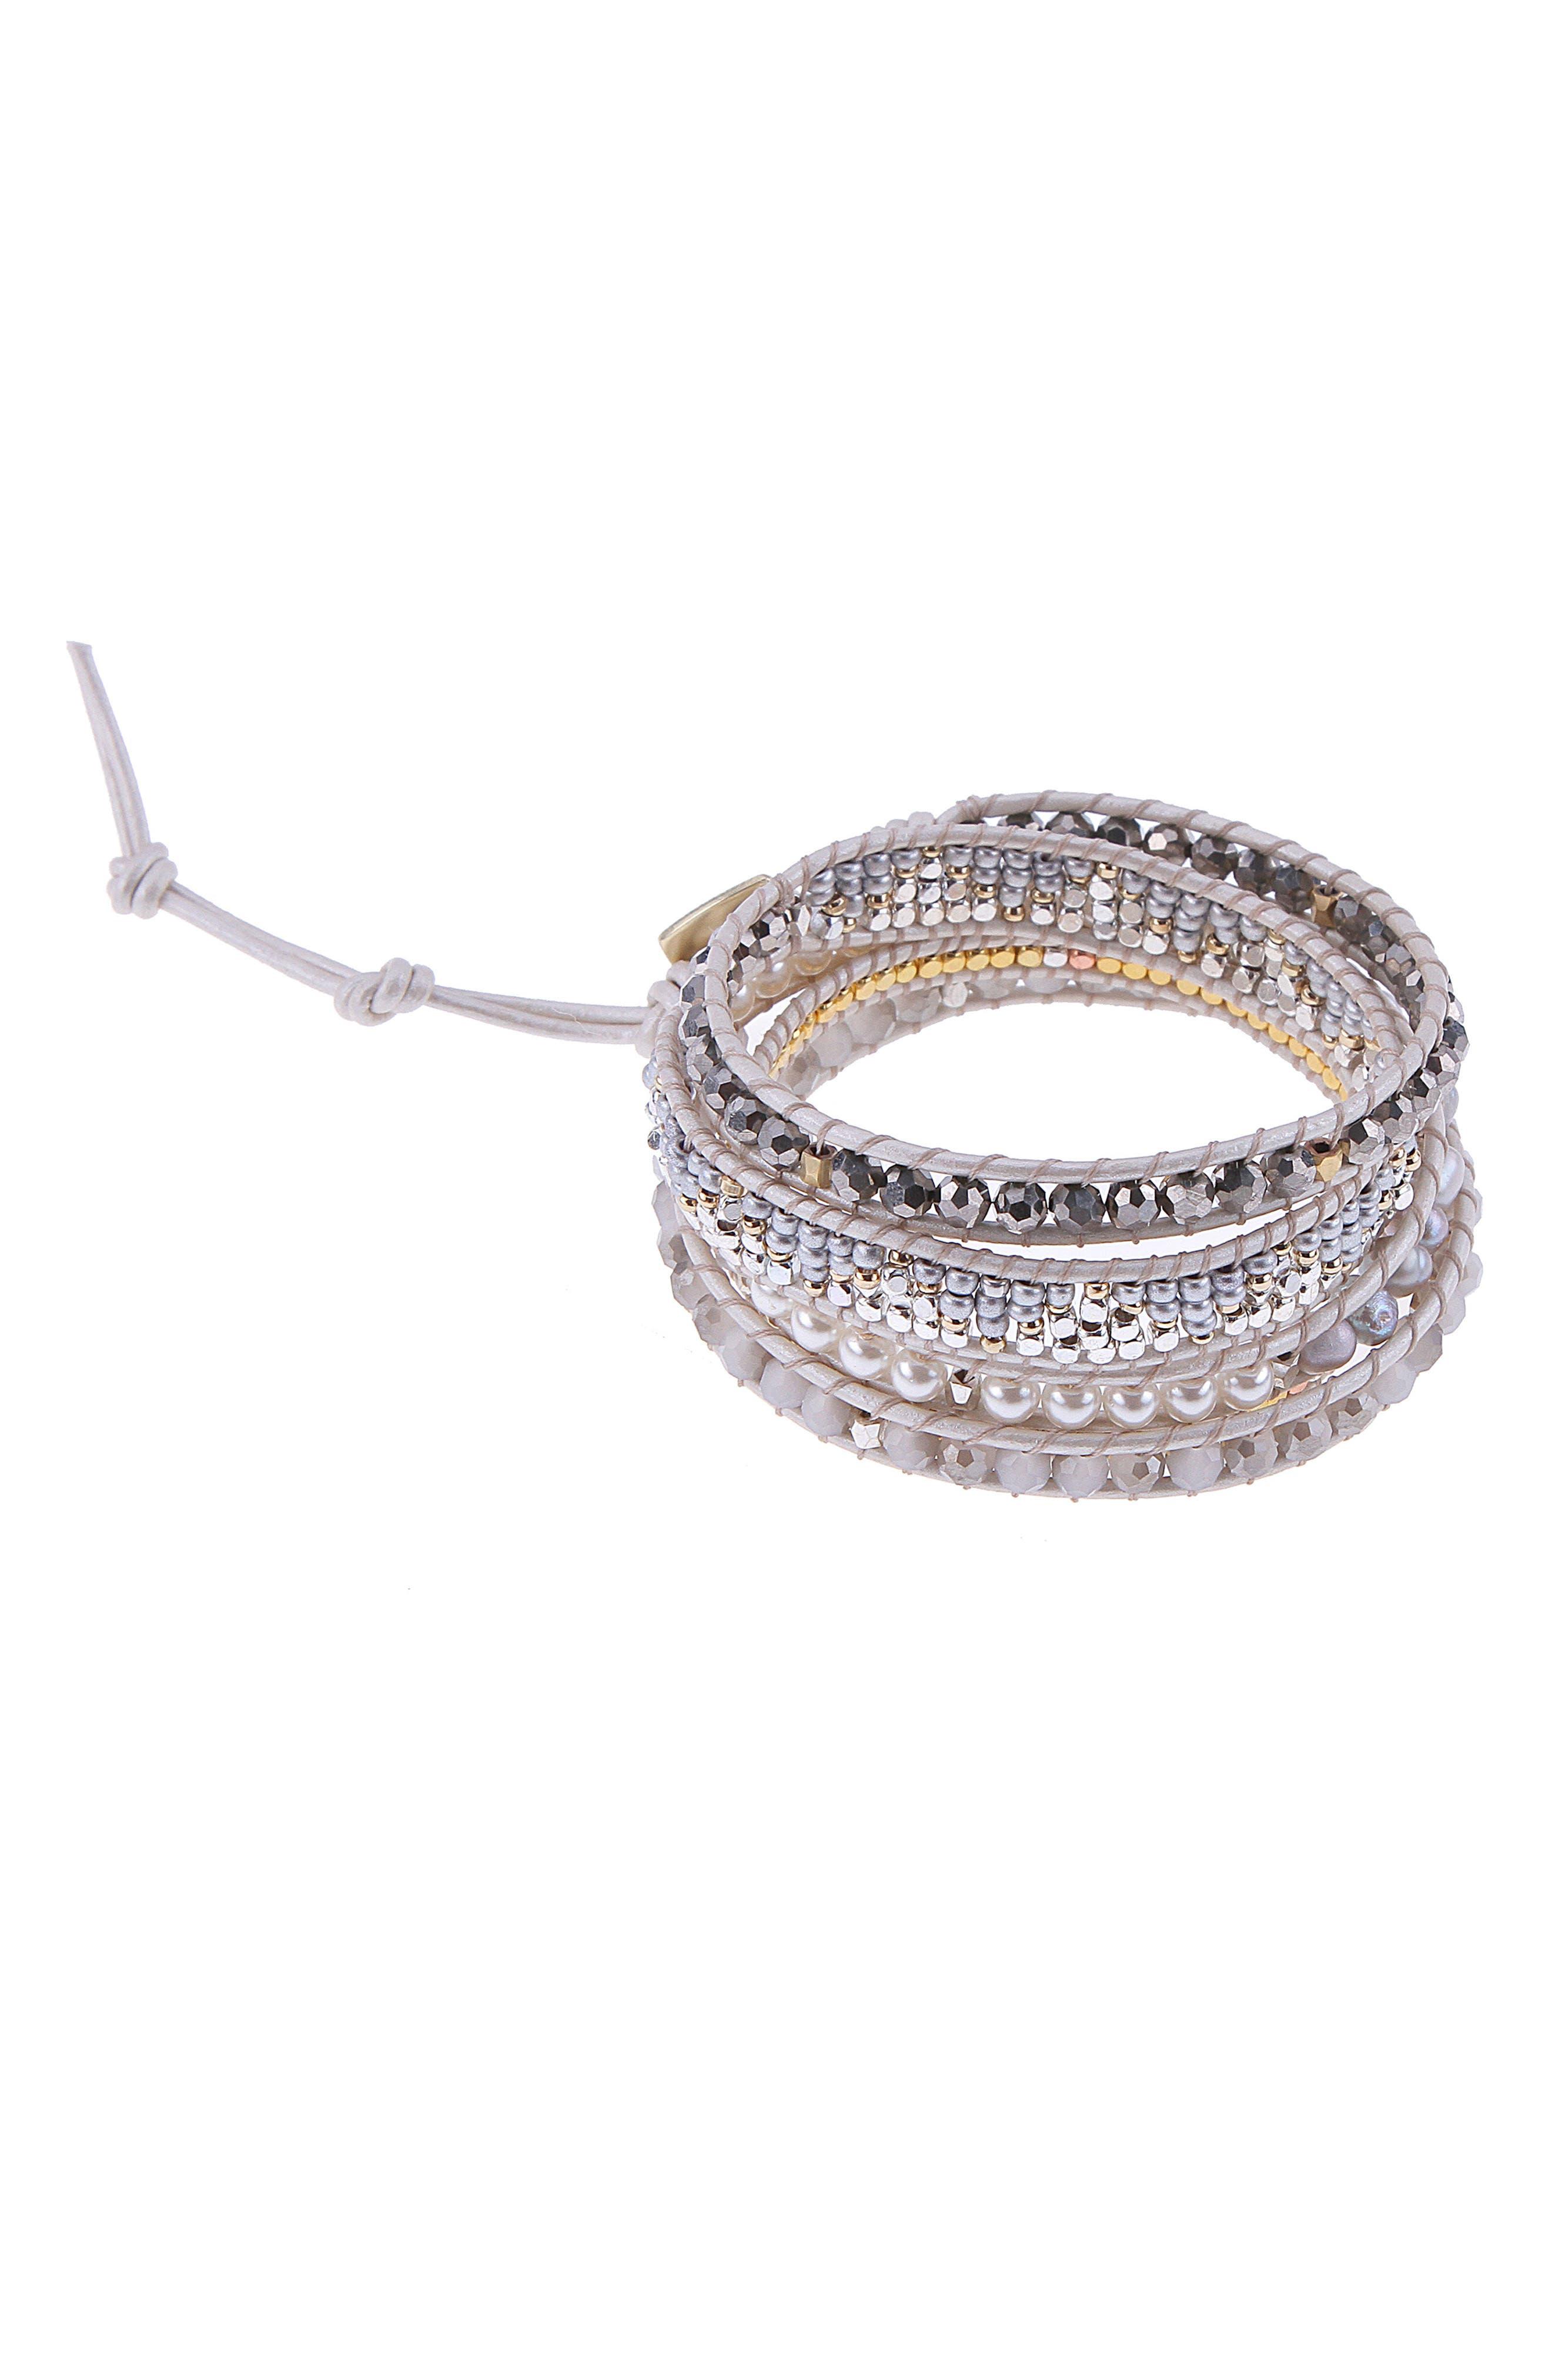 Crystal & Imitation Pearl Beaded Wrap Bracelet,                         Main,                         color, White